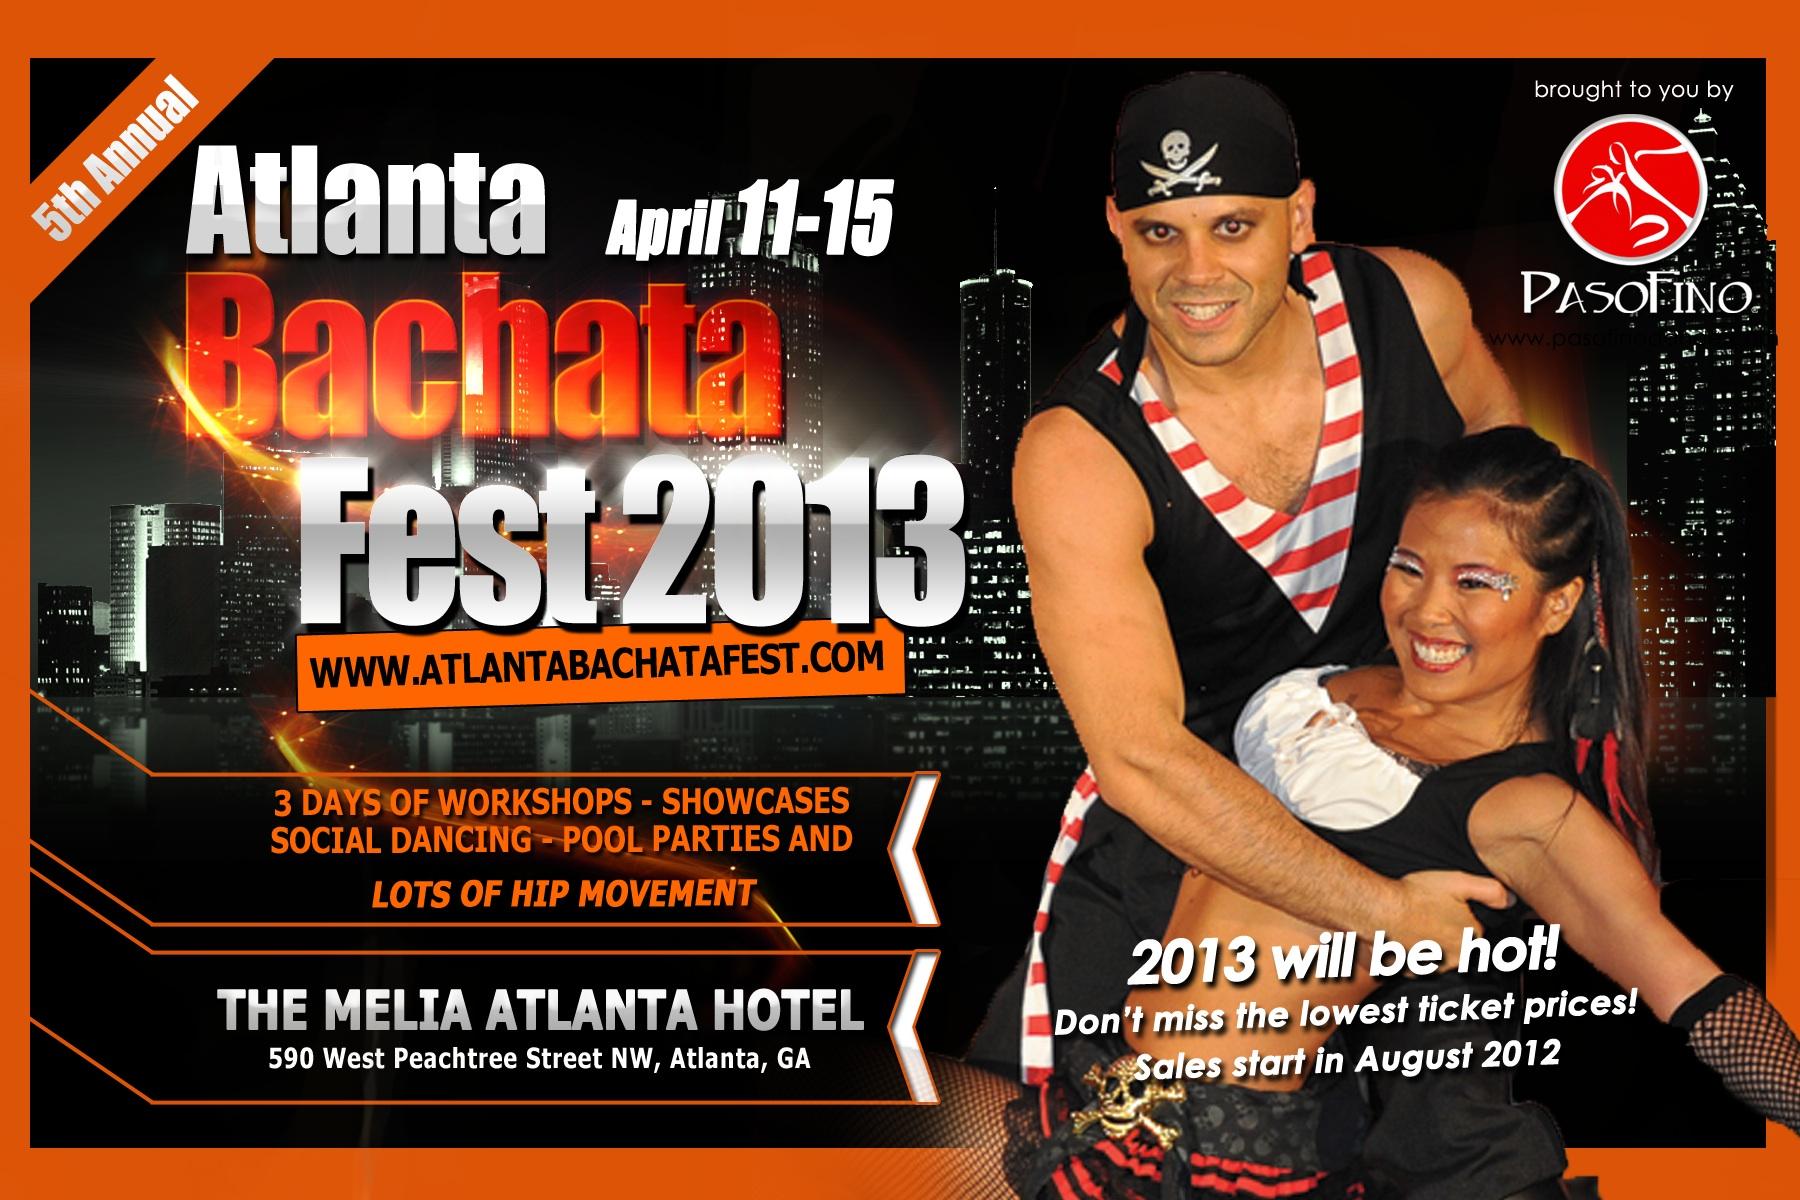 PasoFino Atlanta Bachata Festival 2013